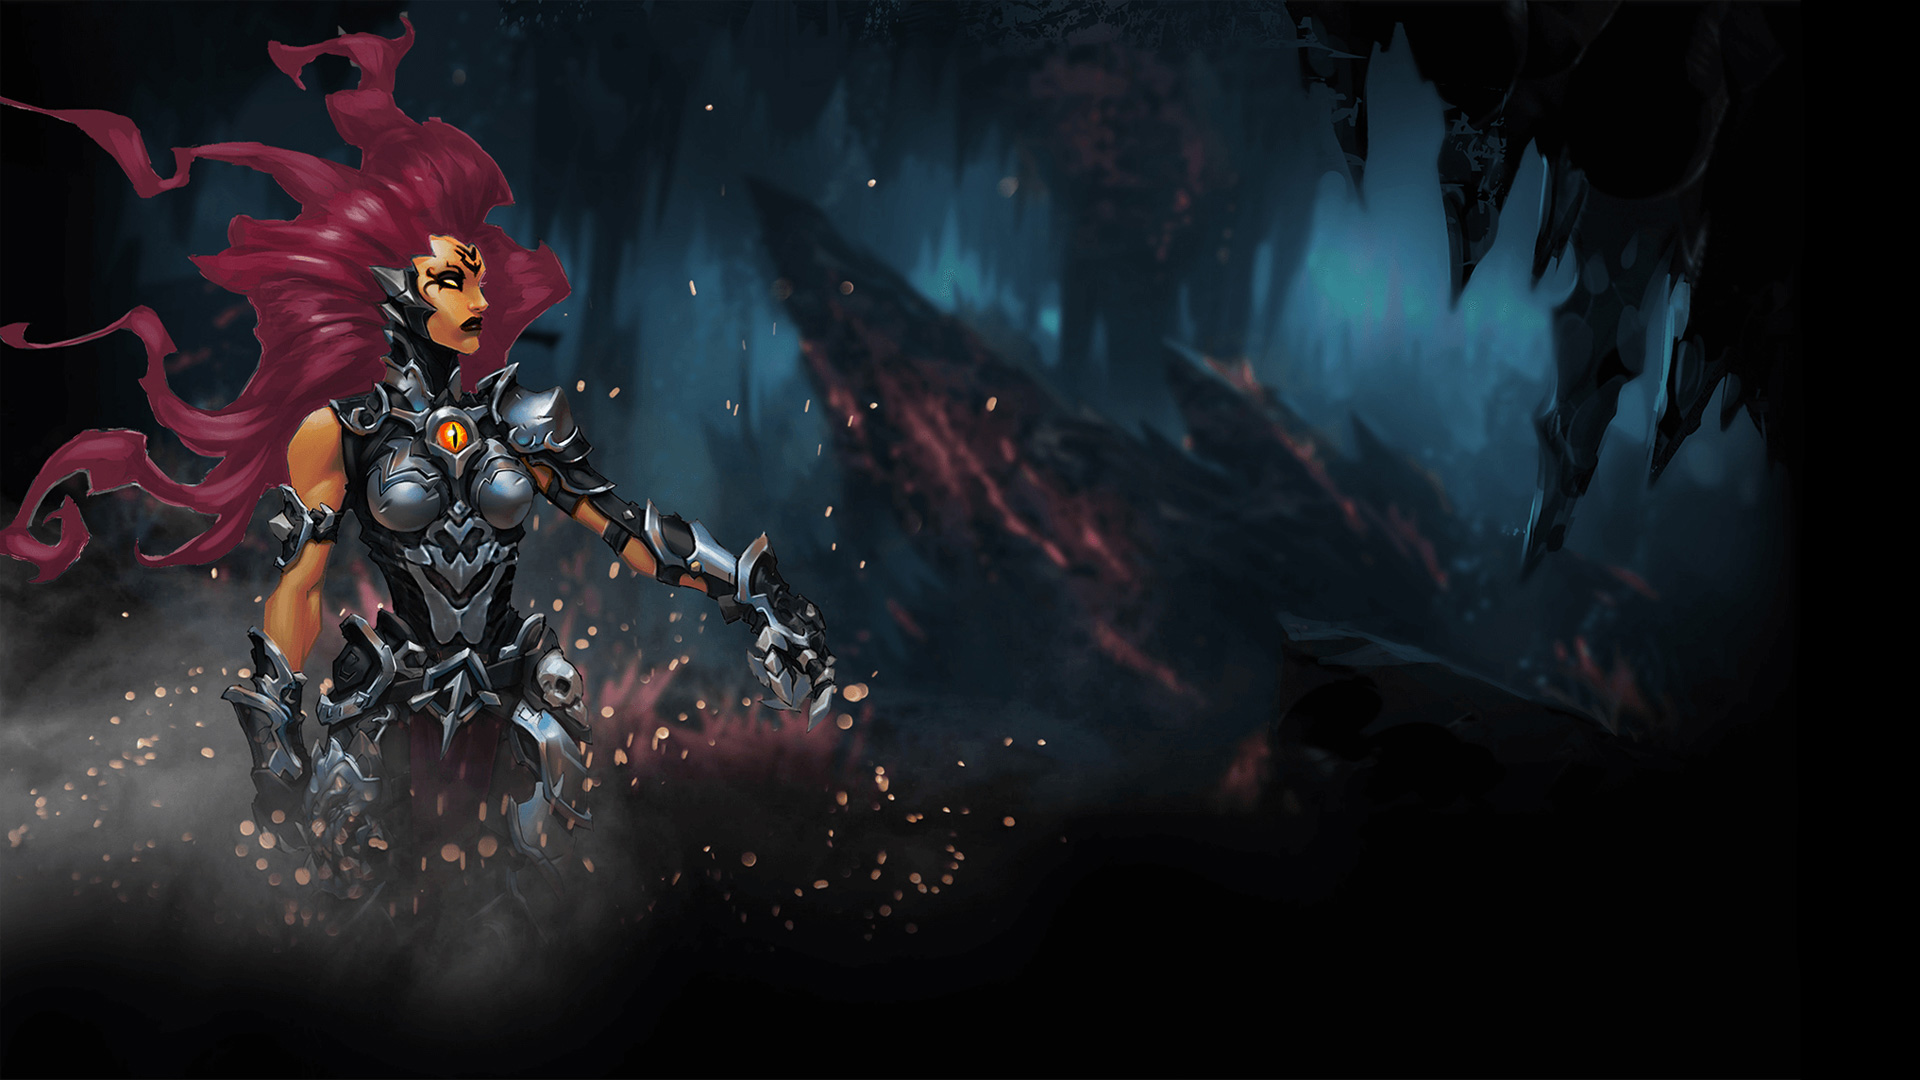 Darksiders iii hd games 4k wallpapers images - Darksiders 3 wallpaper ...